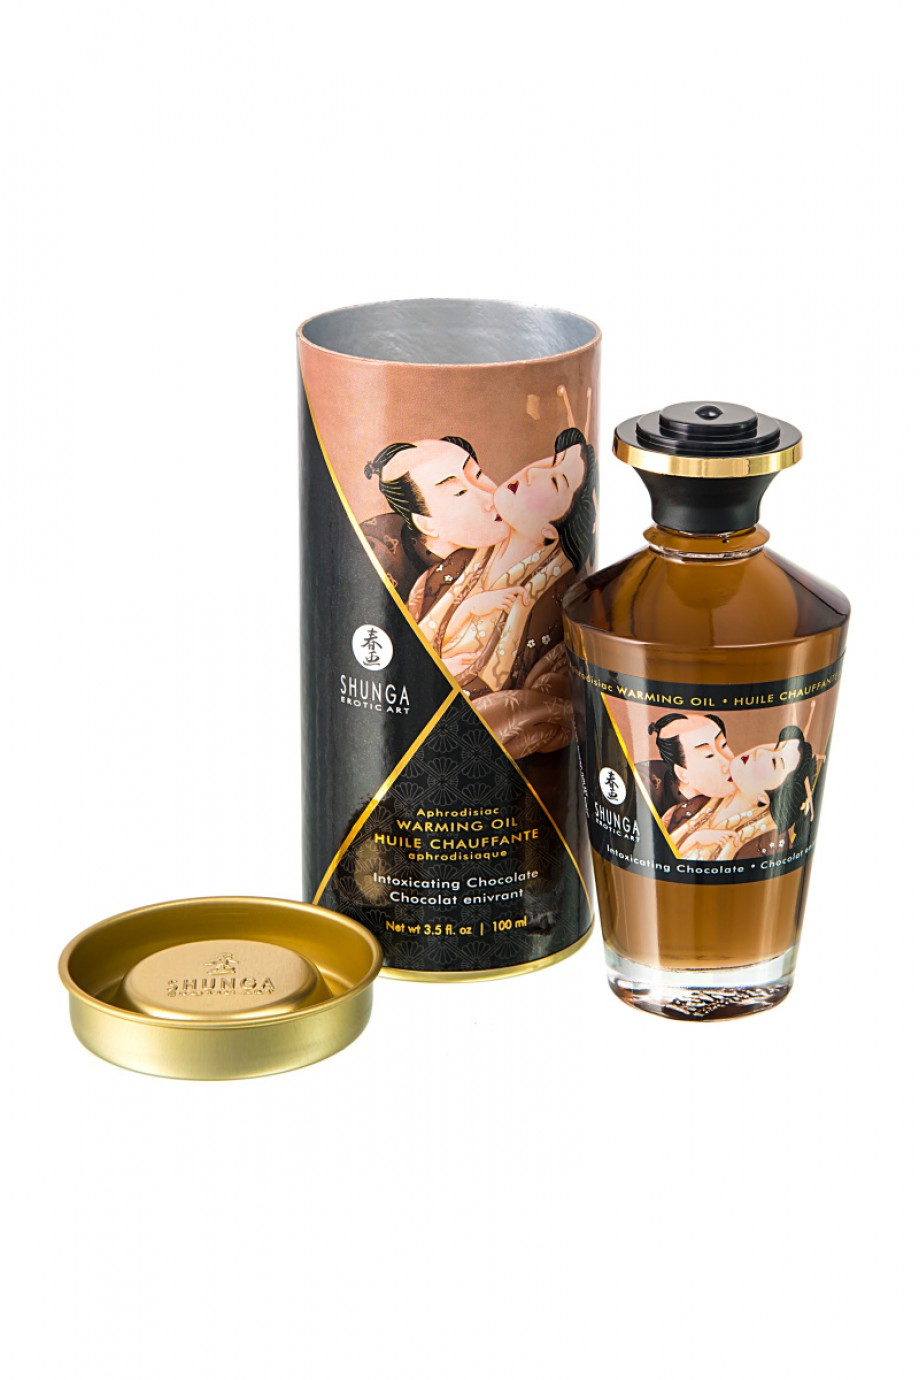 Масло для массажа Shunga Intoxicating Chocolate, разогревающее, с ароматом шоколада, 100 мл